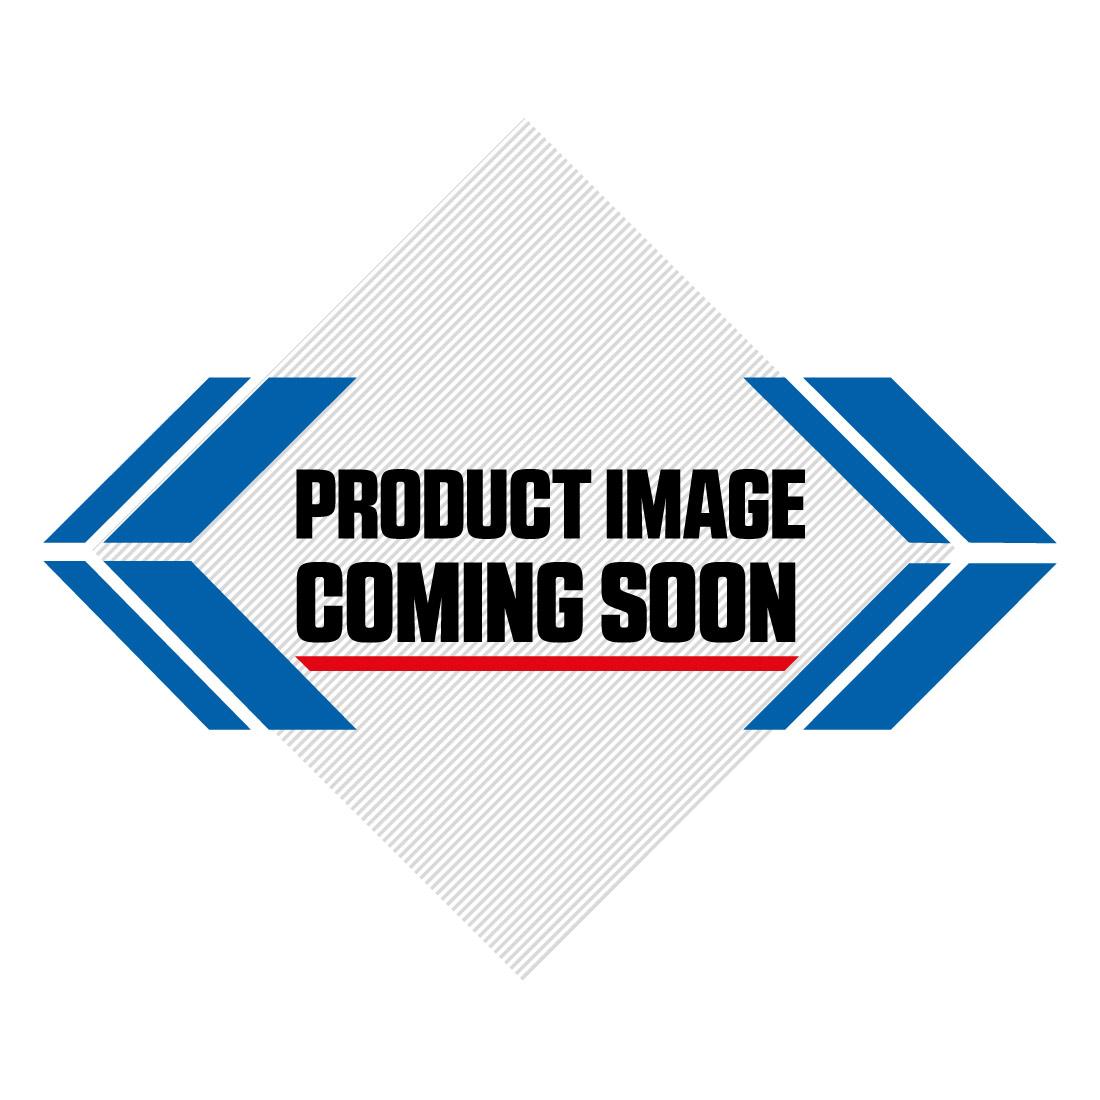 Renthal Twinring Rear Sprocket KTM SX SX-F EXC EXC-F Husqvarna TC FC TE FE - Orange Image-0